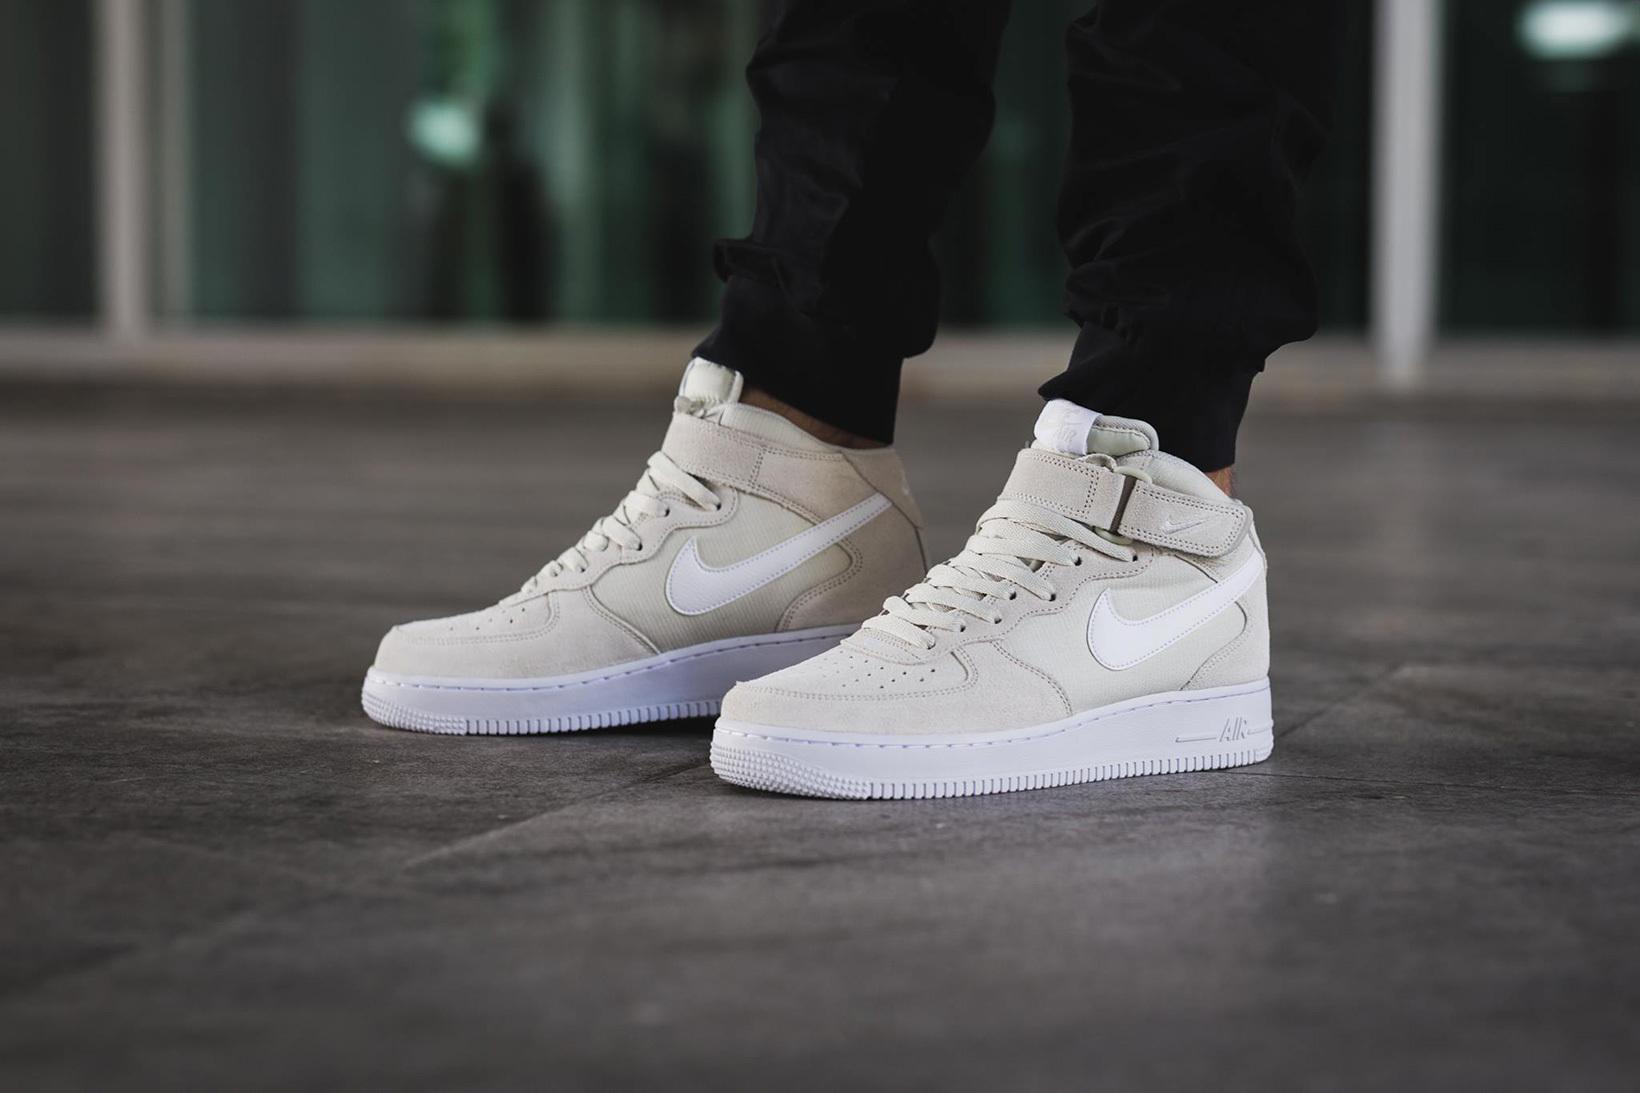 nike-air-force-1-mid-light-bone-sneaker-2